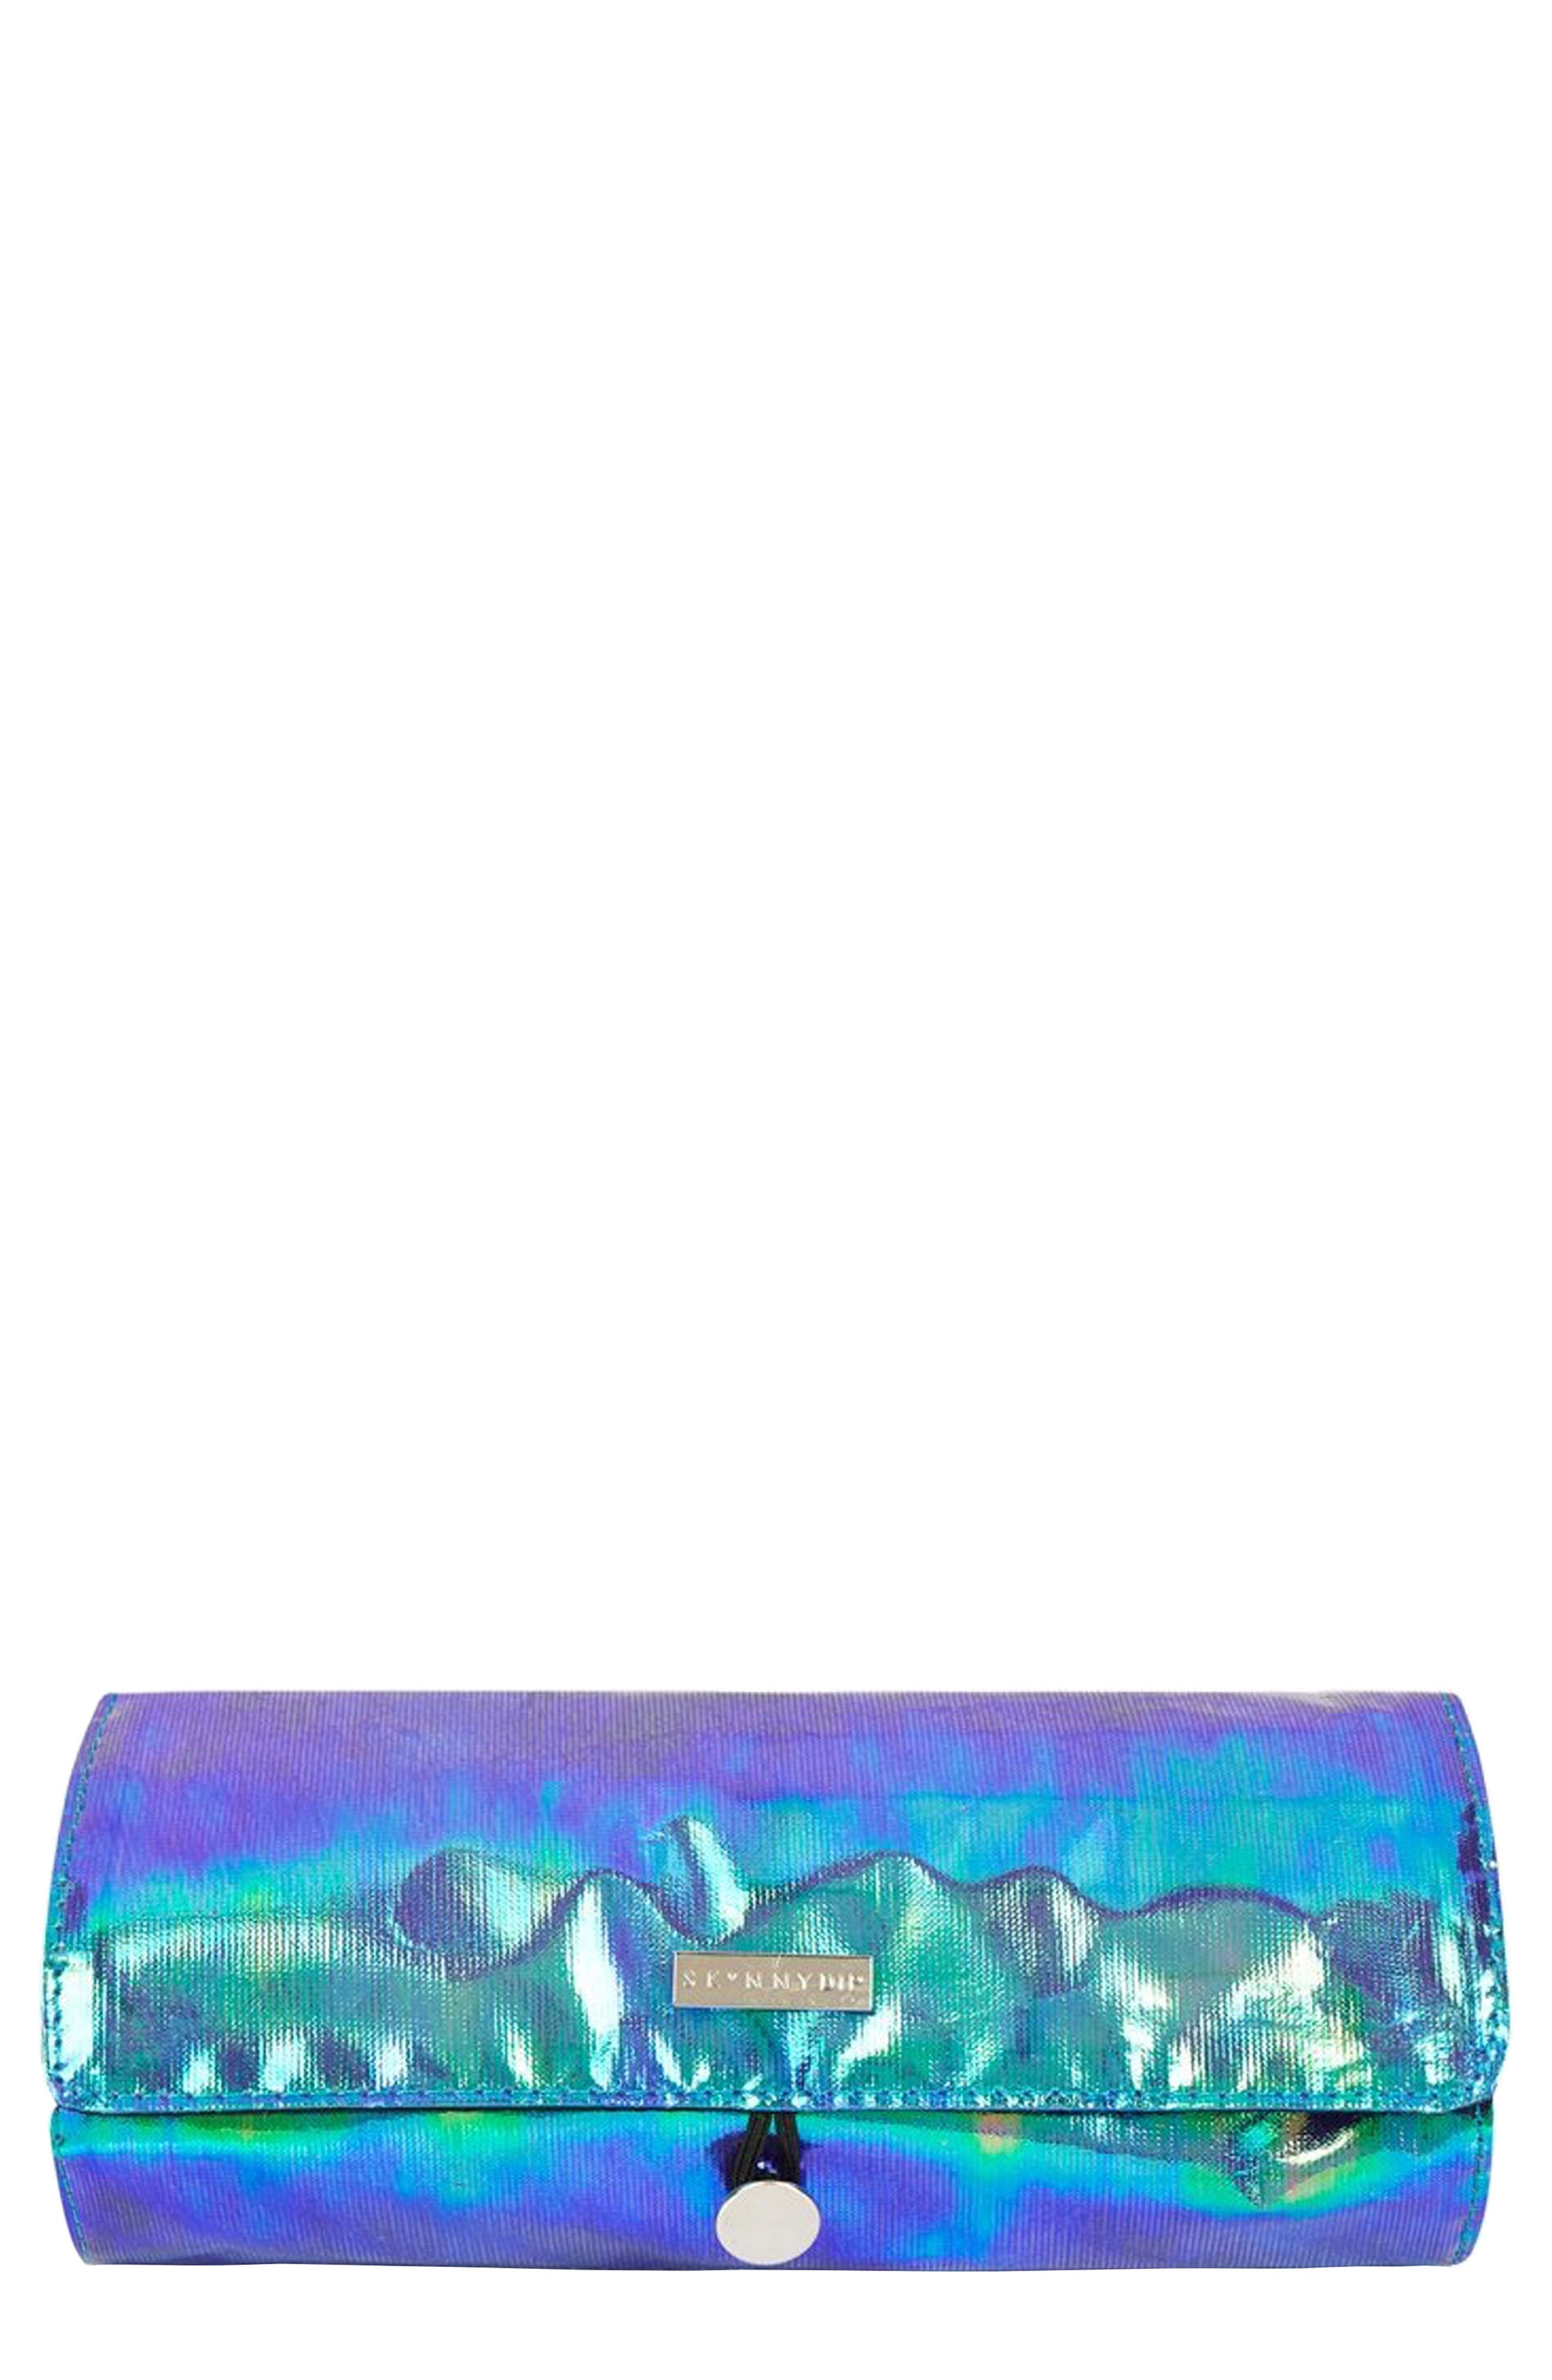 Skinny Dip Mermaid Makeup Roll